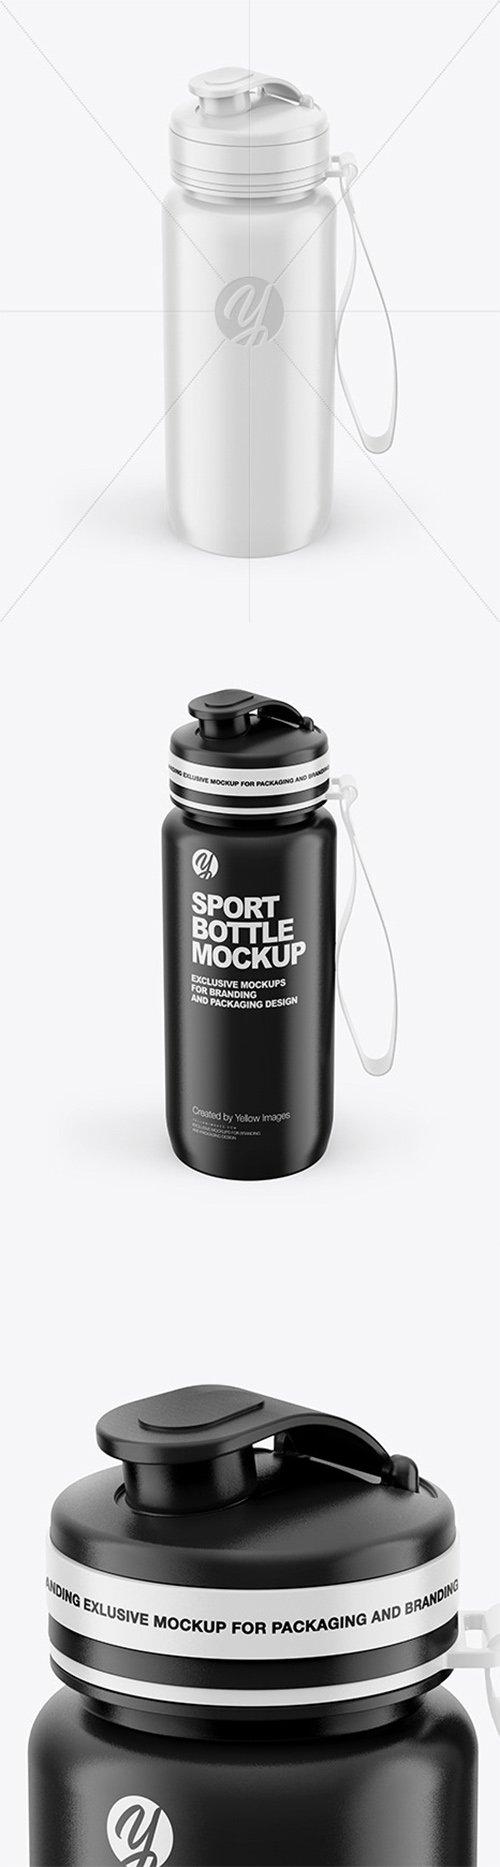 Glossy Sport Bottle Mockup 64735